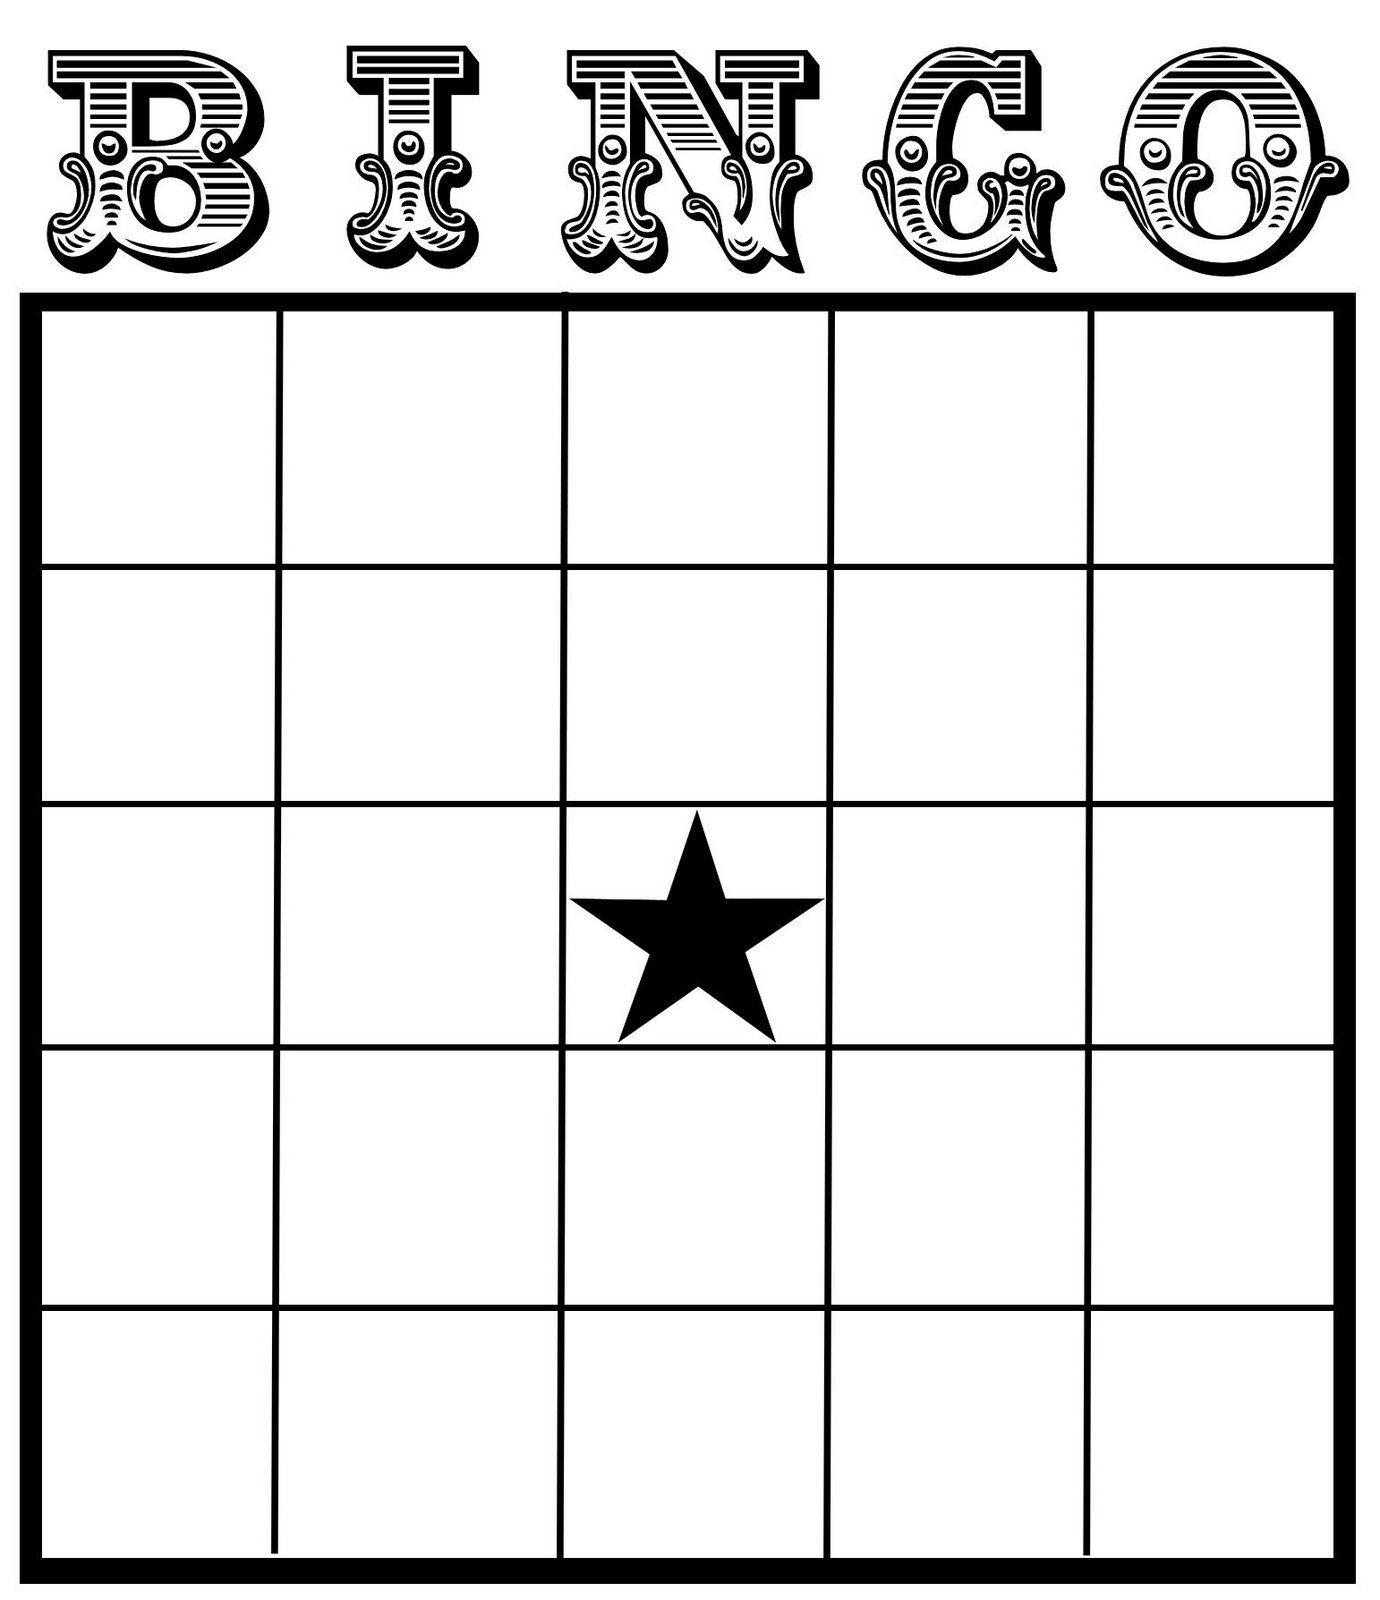 Bingo Card - Bing Images | Bingo Card Template, Blank Bingo